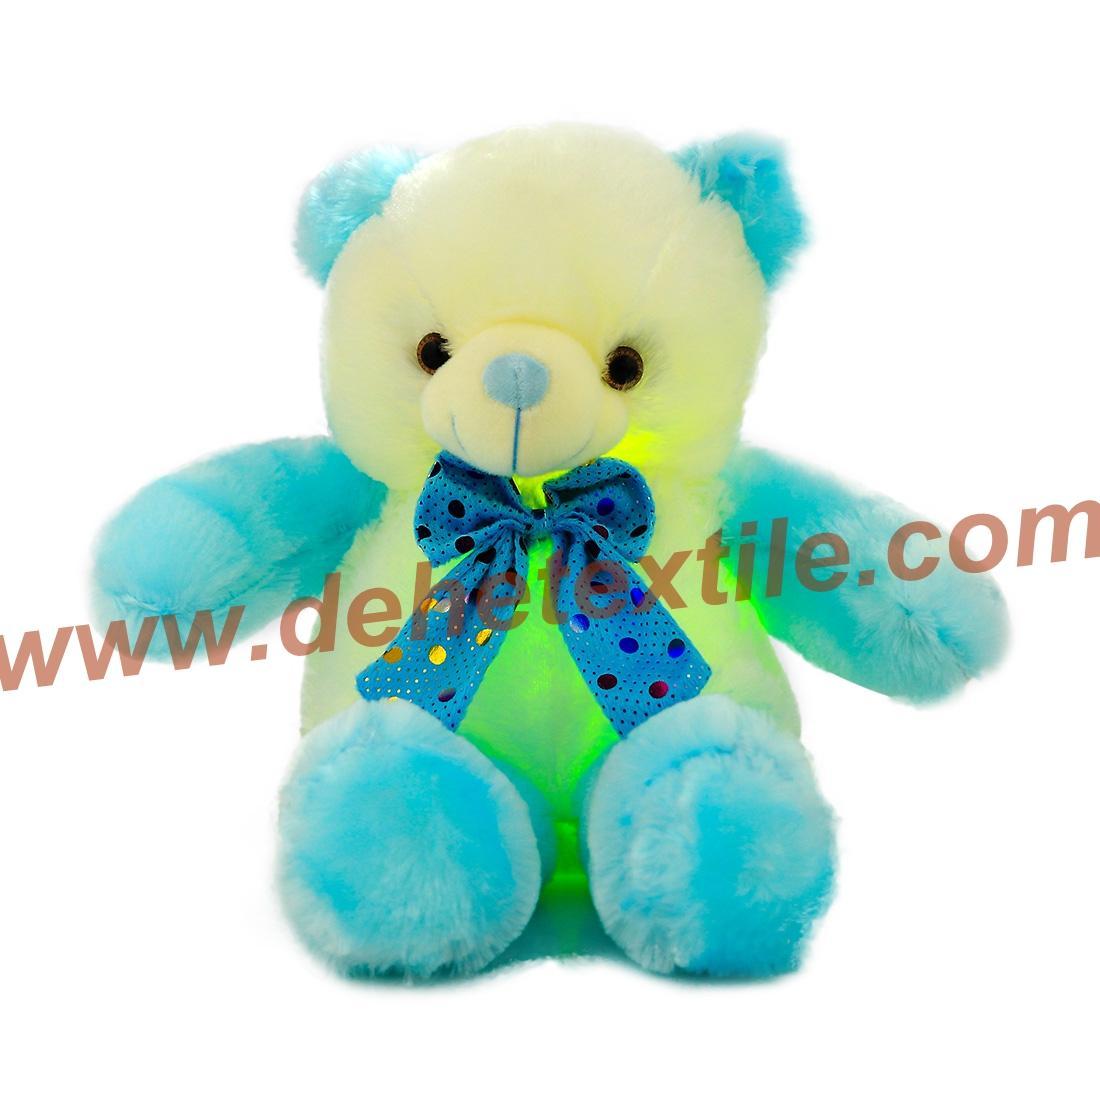 New Style LED Inductive Teddy Bear Stuffed Animals Plush Toy  11